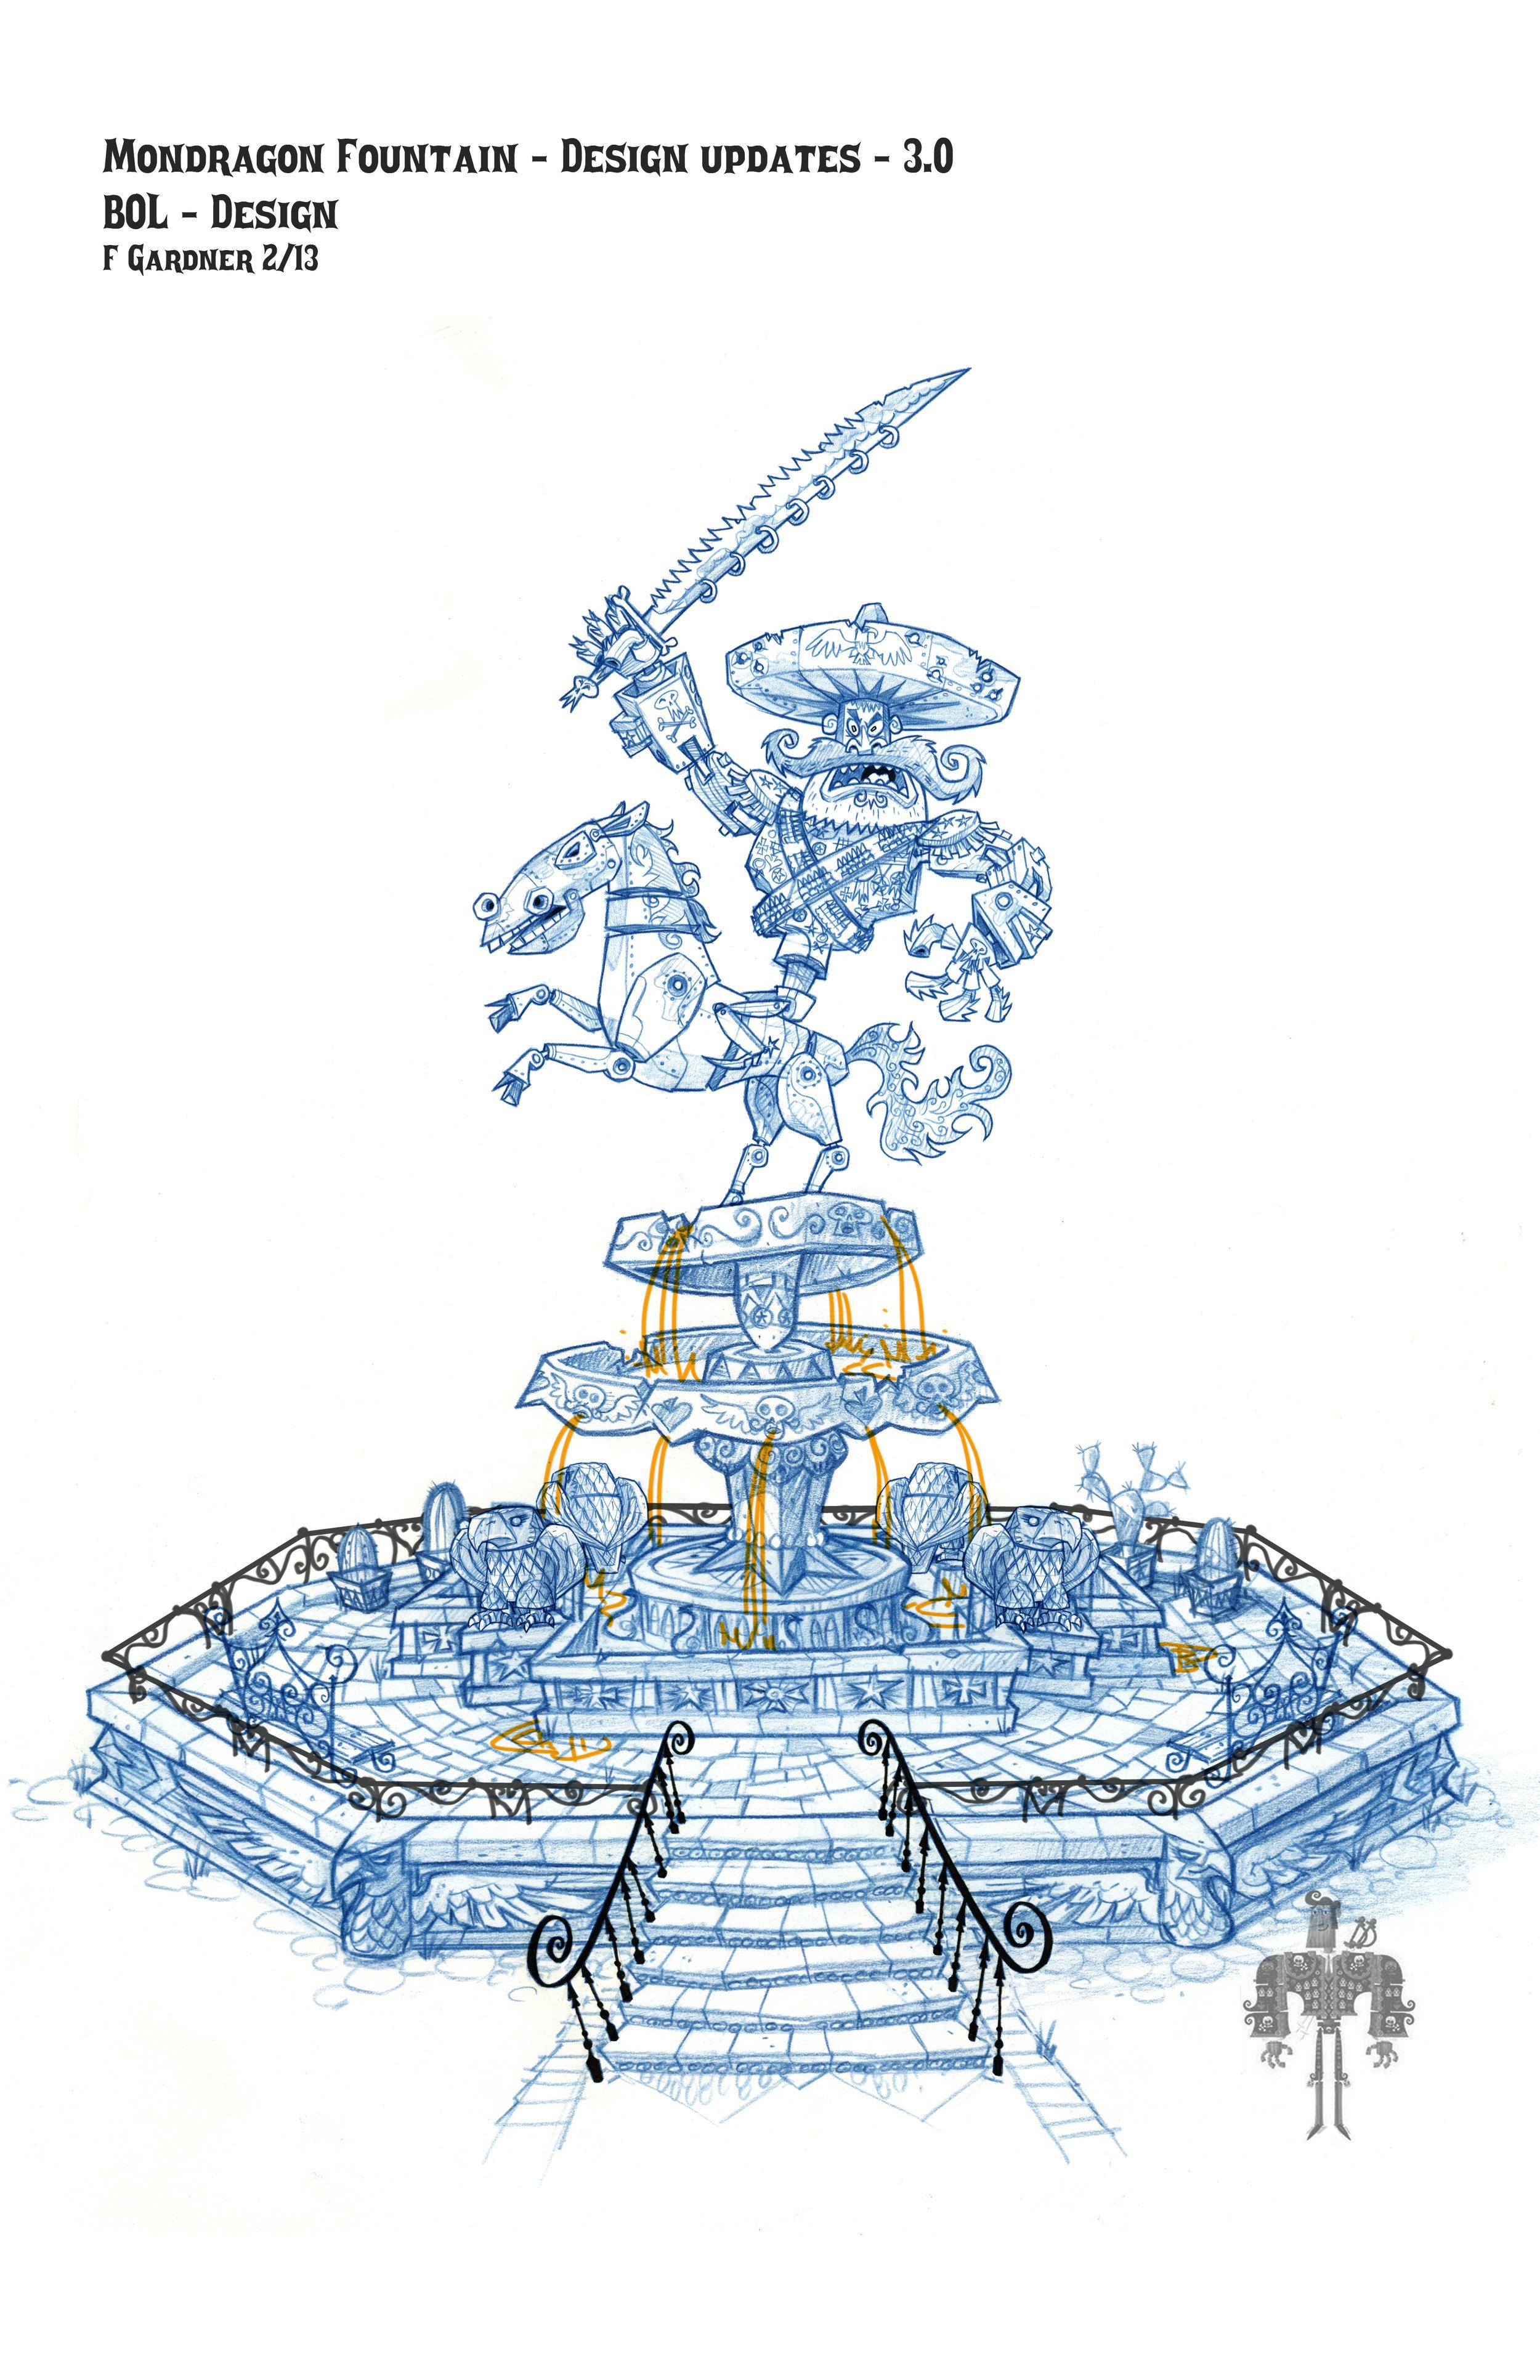 Mondragon Fountain Updates3.jpg